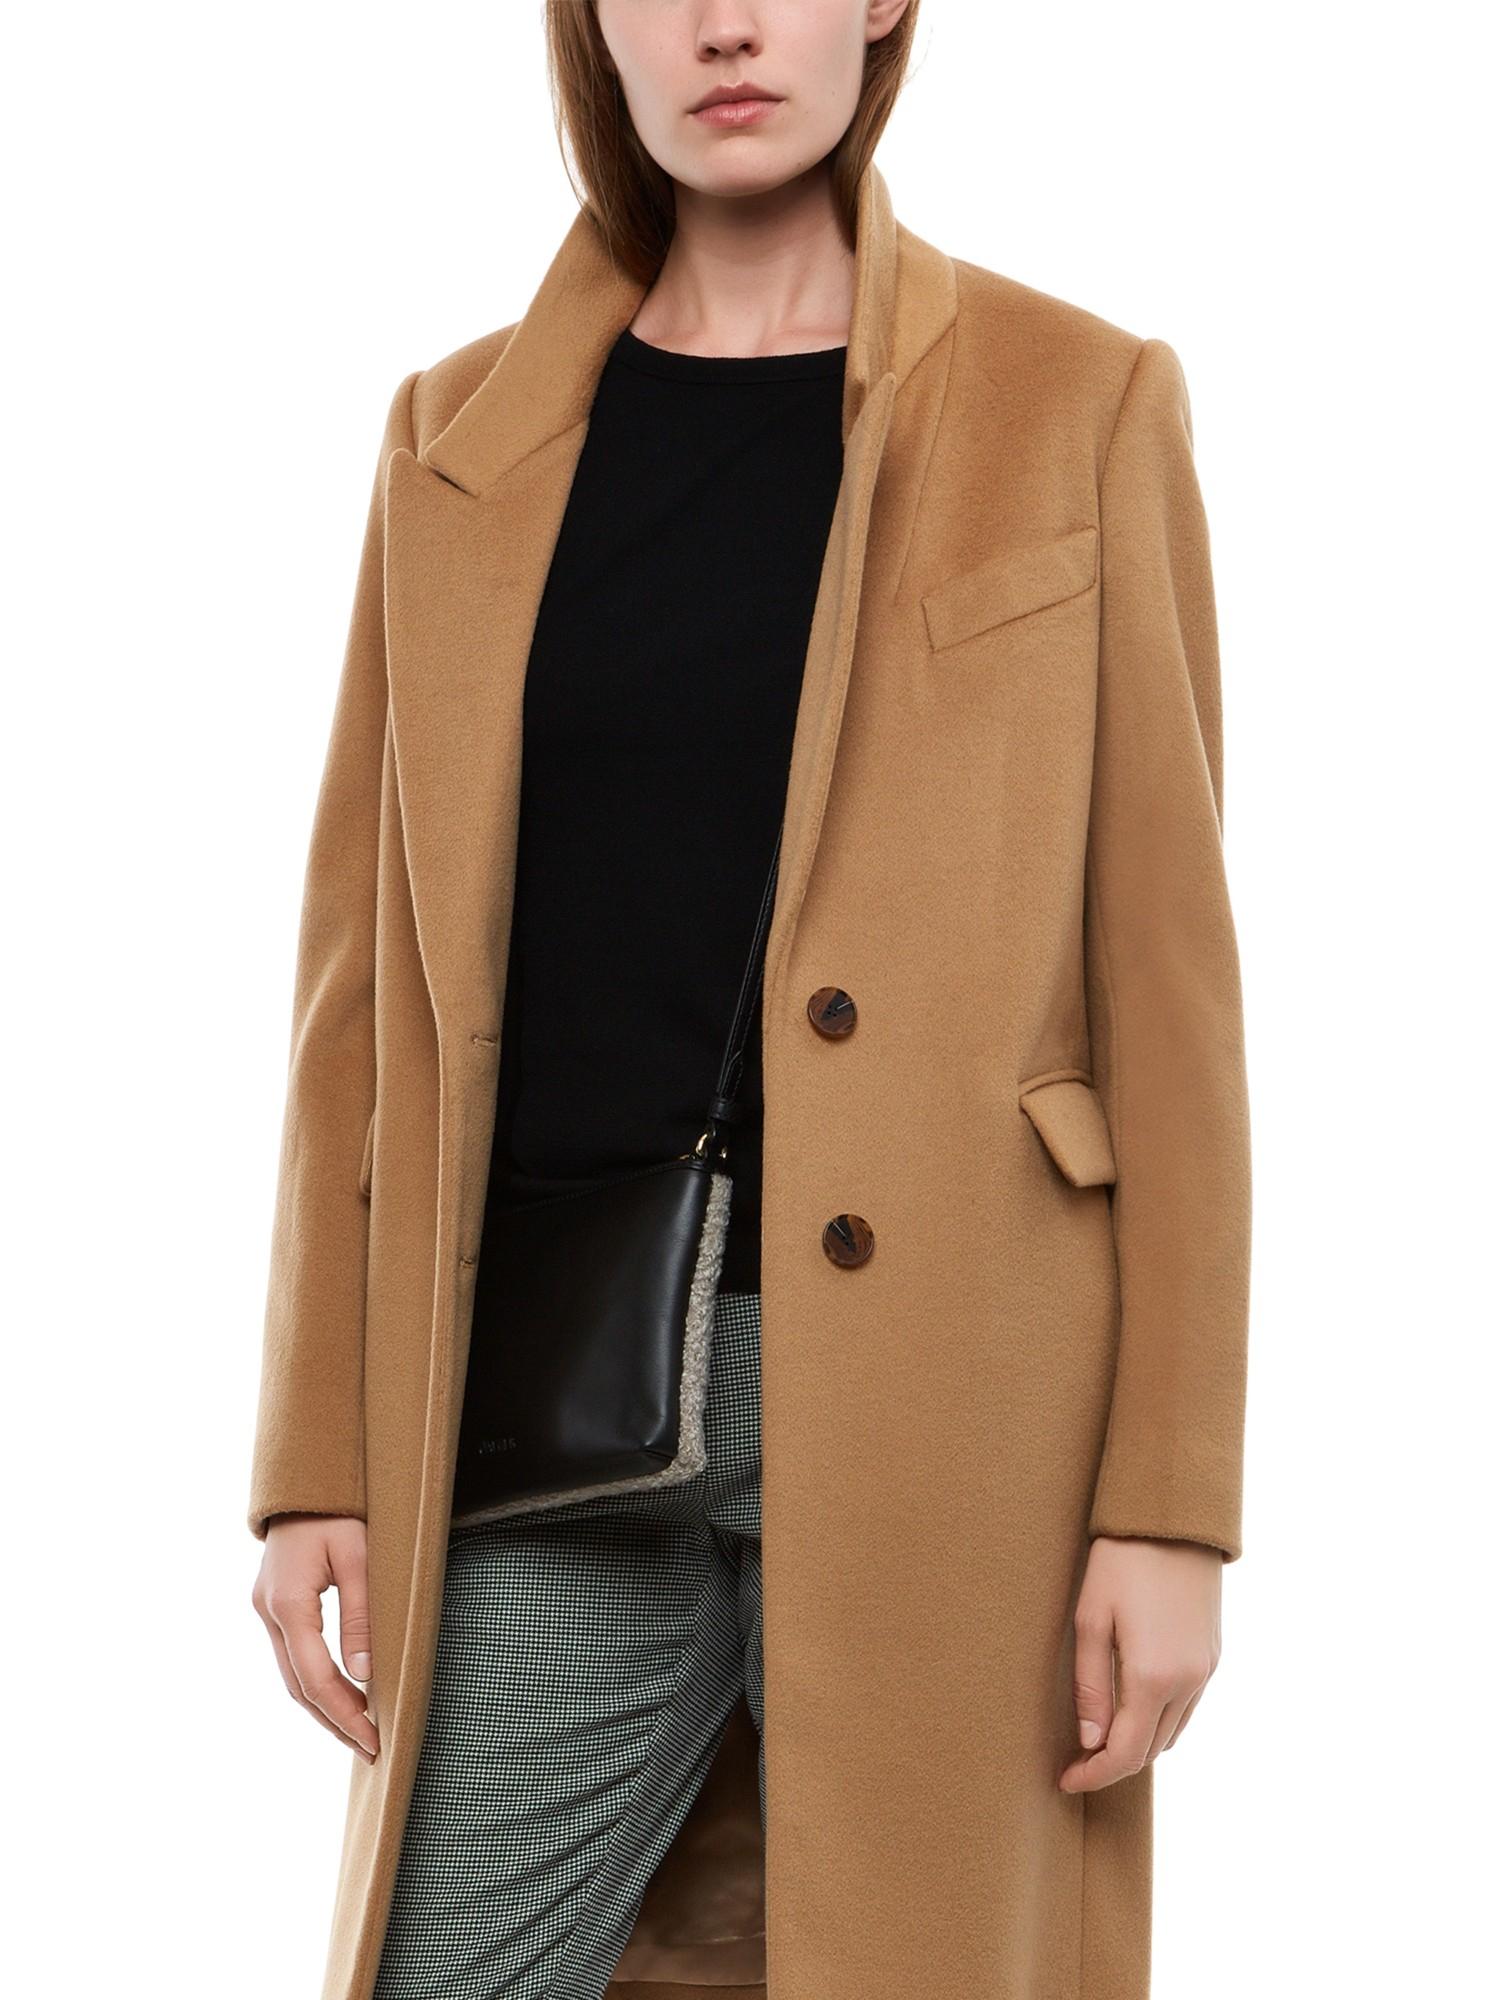 Jaeger Wool Cashmere Boyfriend Coat in Brown | Lyst